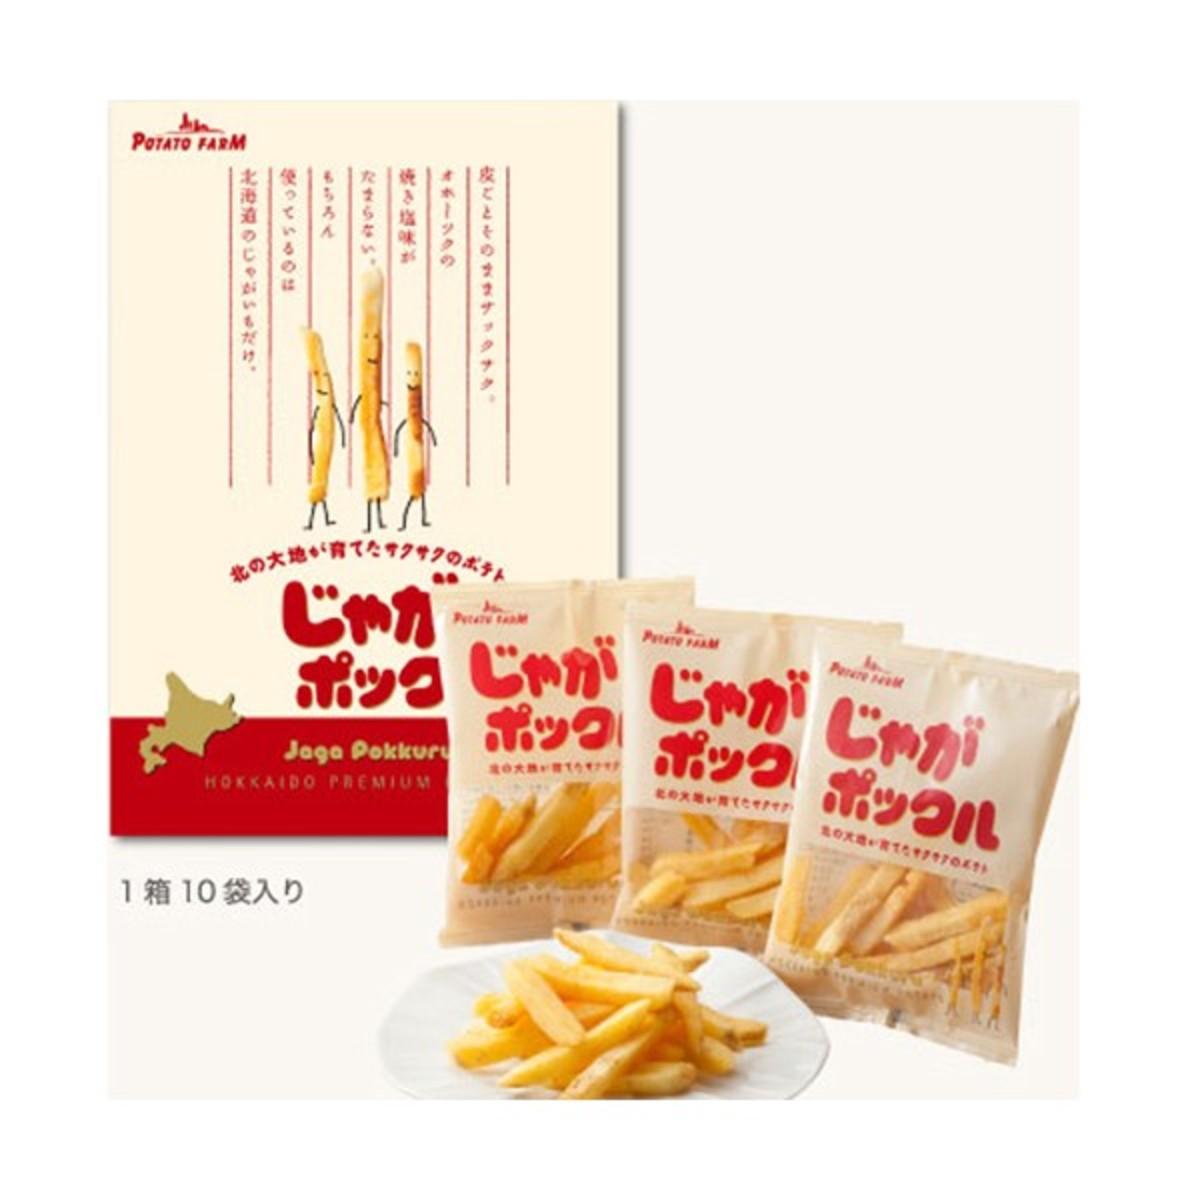 (10 Packets/Box) (Brothers) Japan Hokkaido Premium Potato-Jaga Pokkuru x 1 Box